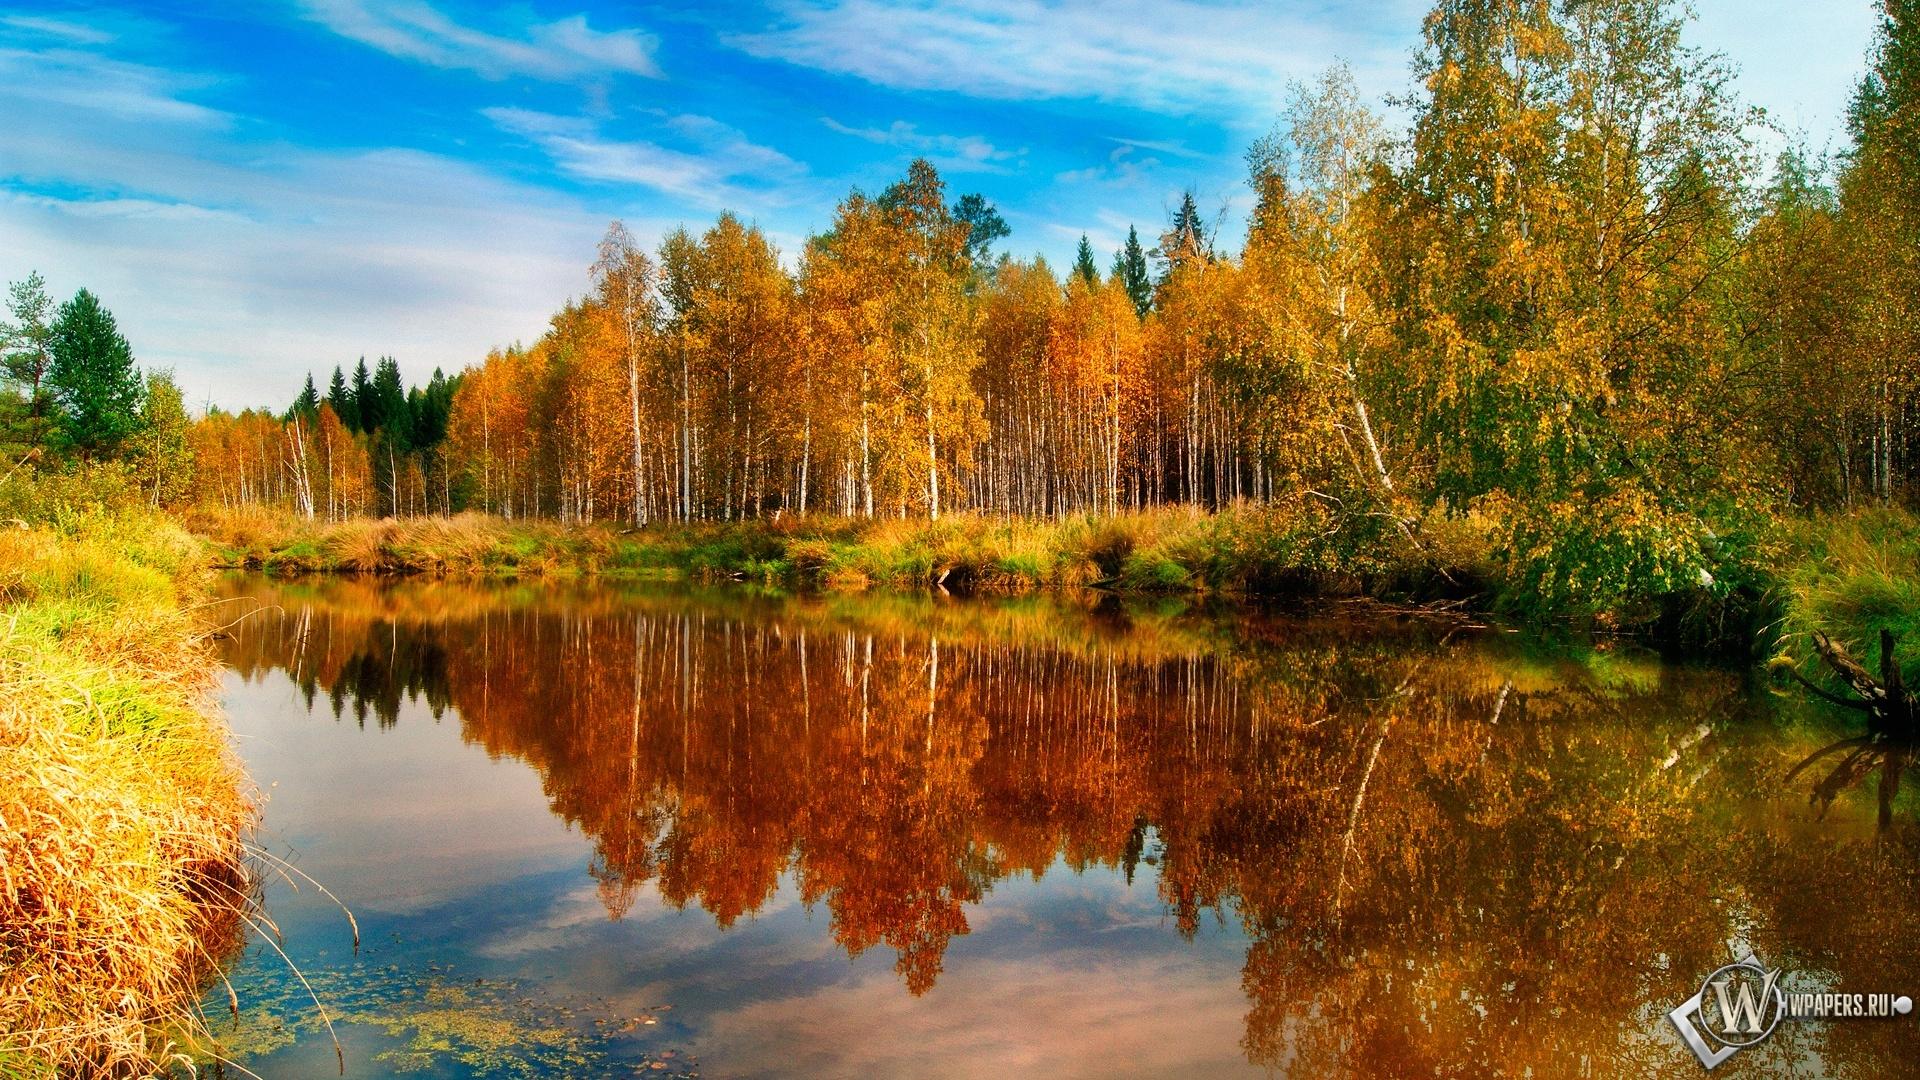 Озеро в лесу 1920x1080